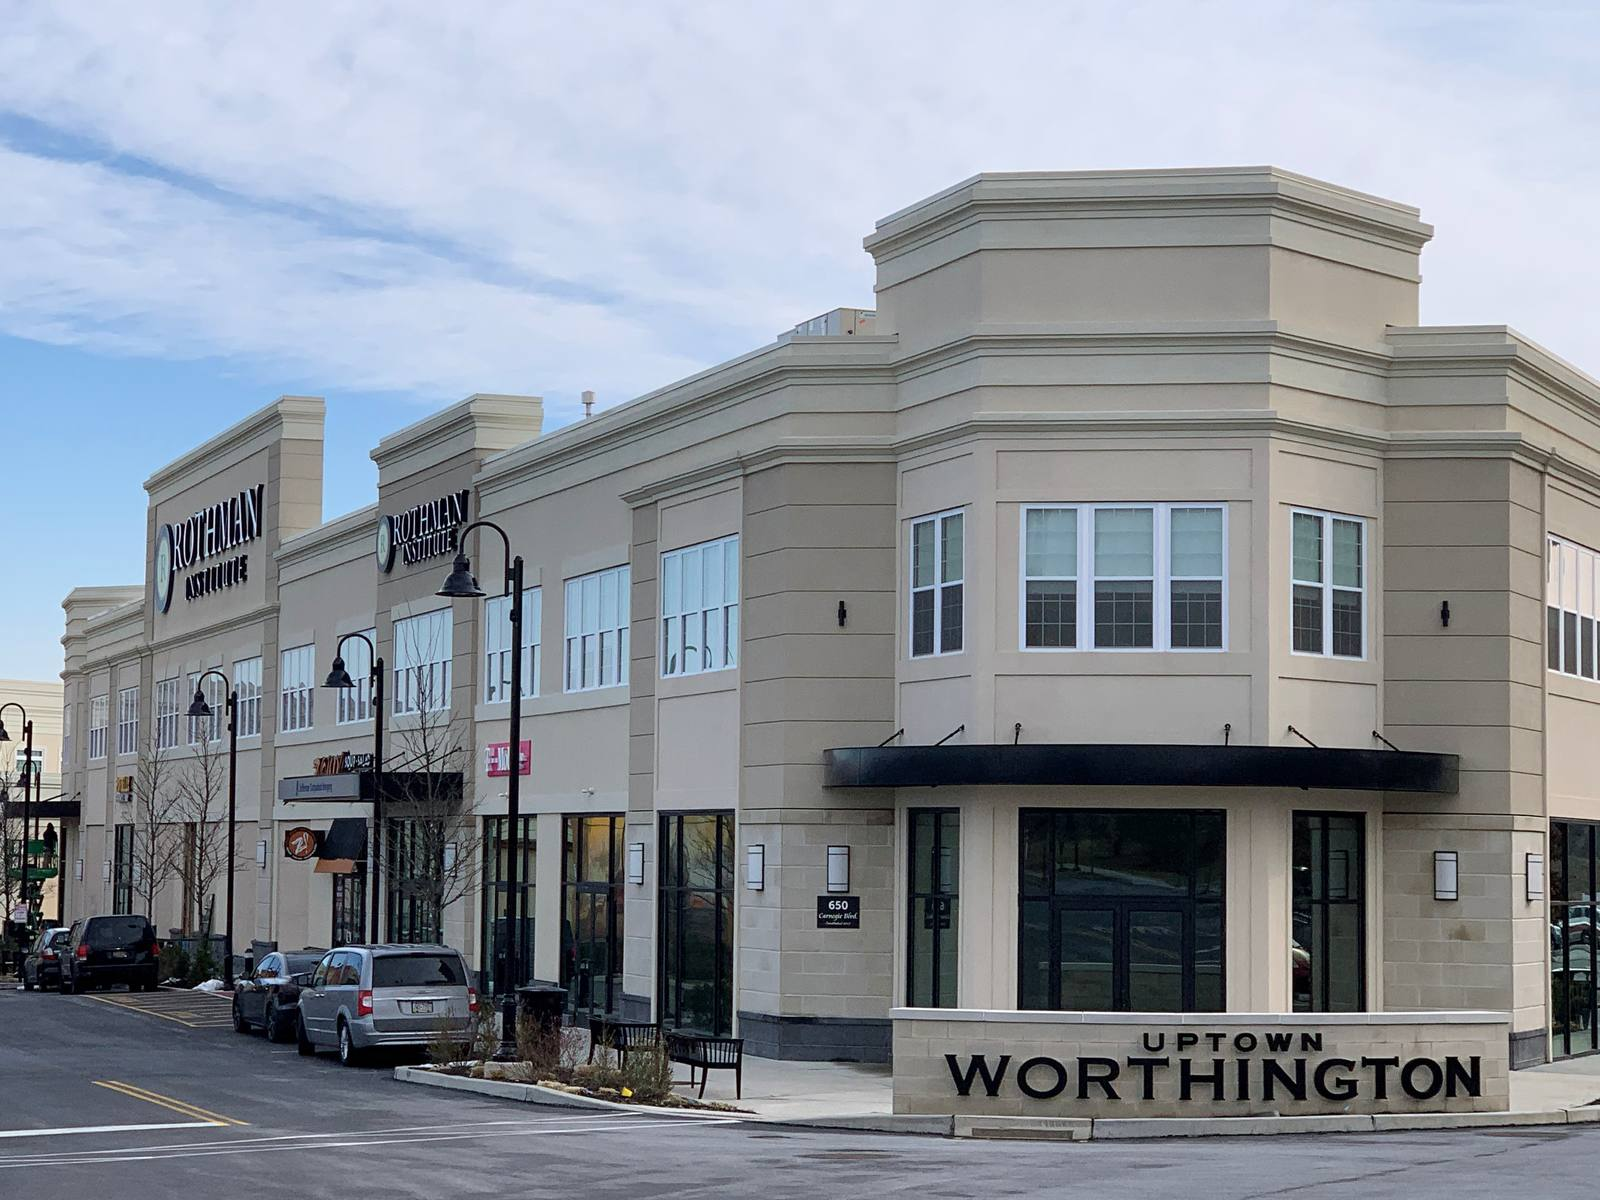 CBRE RetailUptown WorthingtonRoute 202 & S Morehall Road  Photo